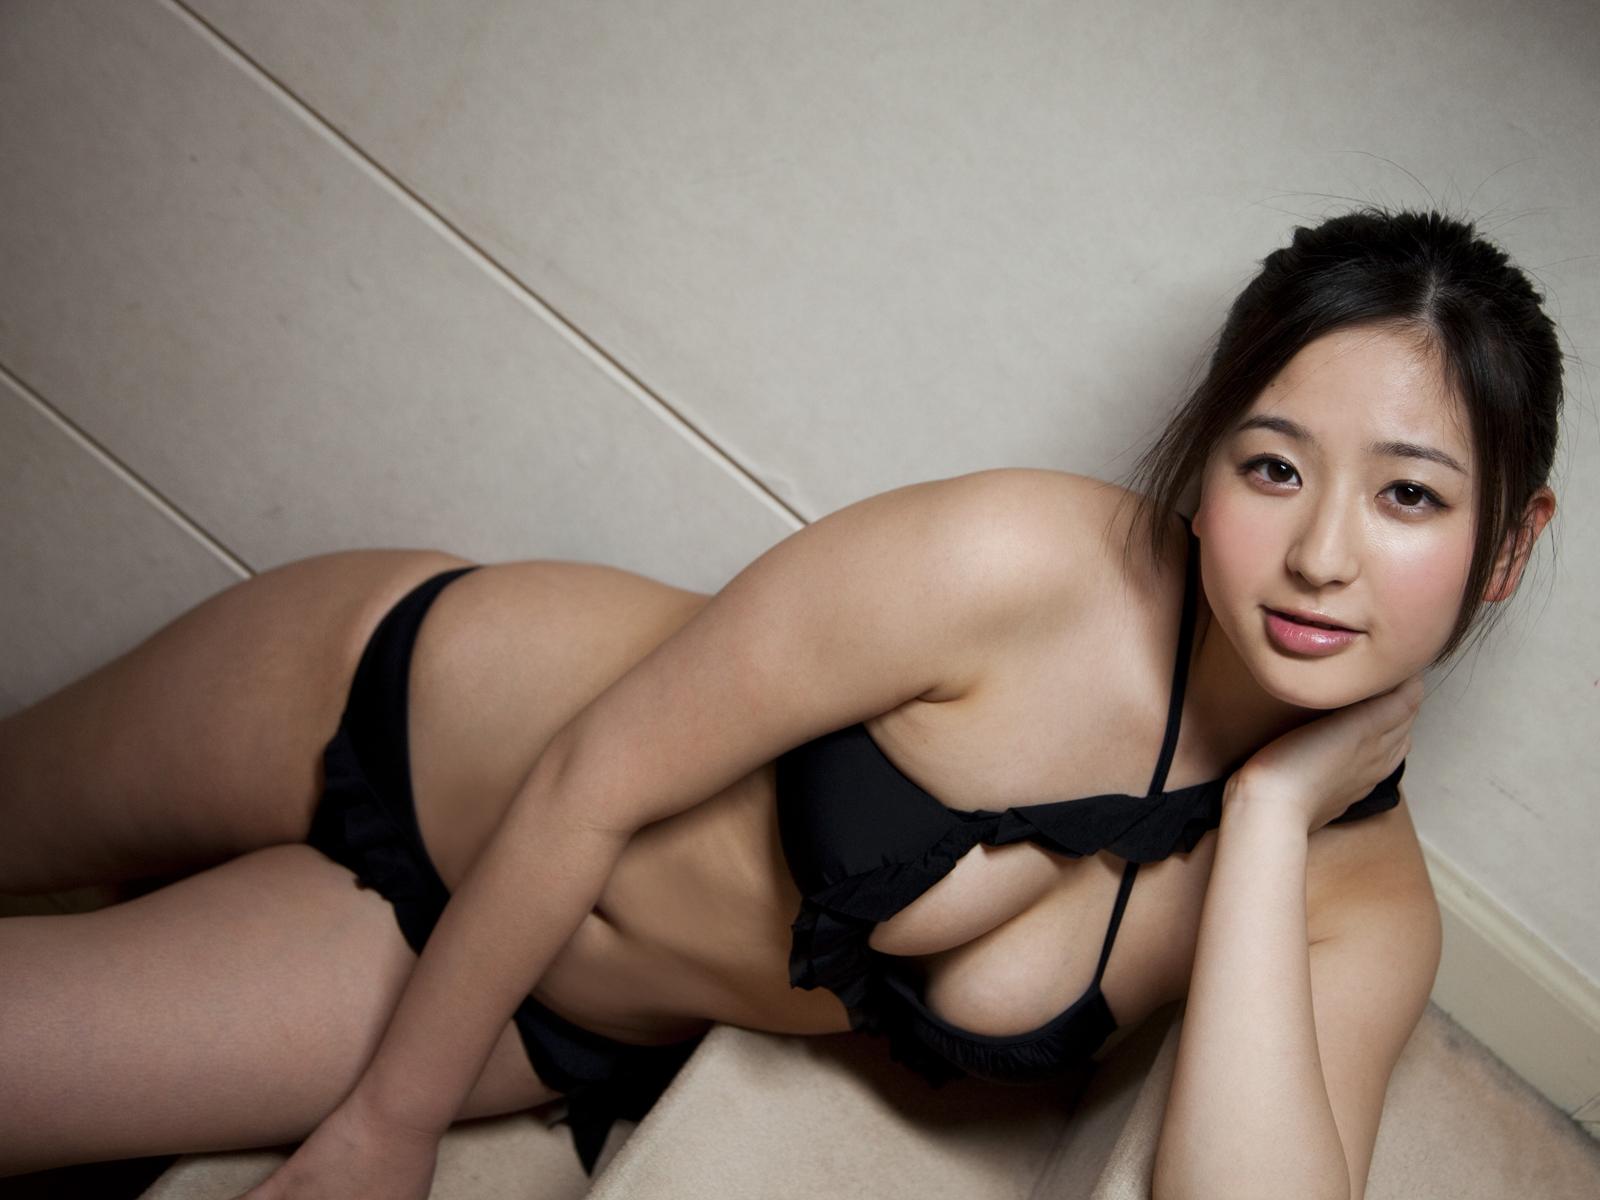 5 asian sluts vs 5 bbcf70 - 3 9